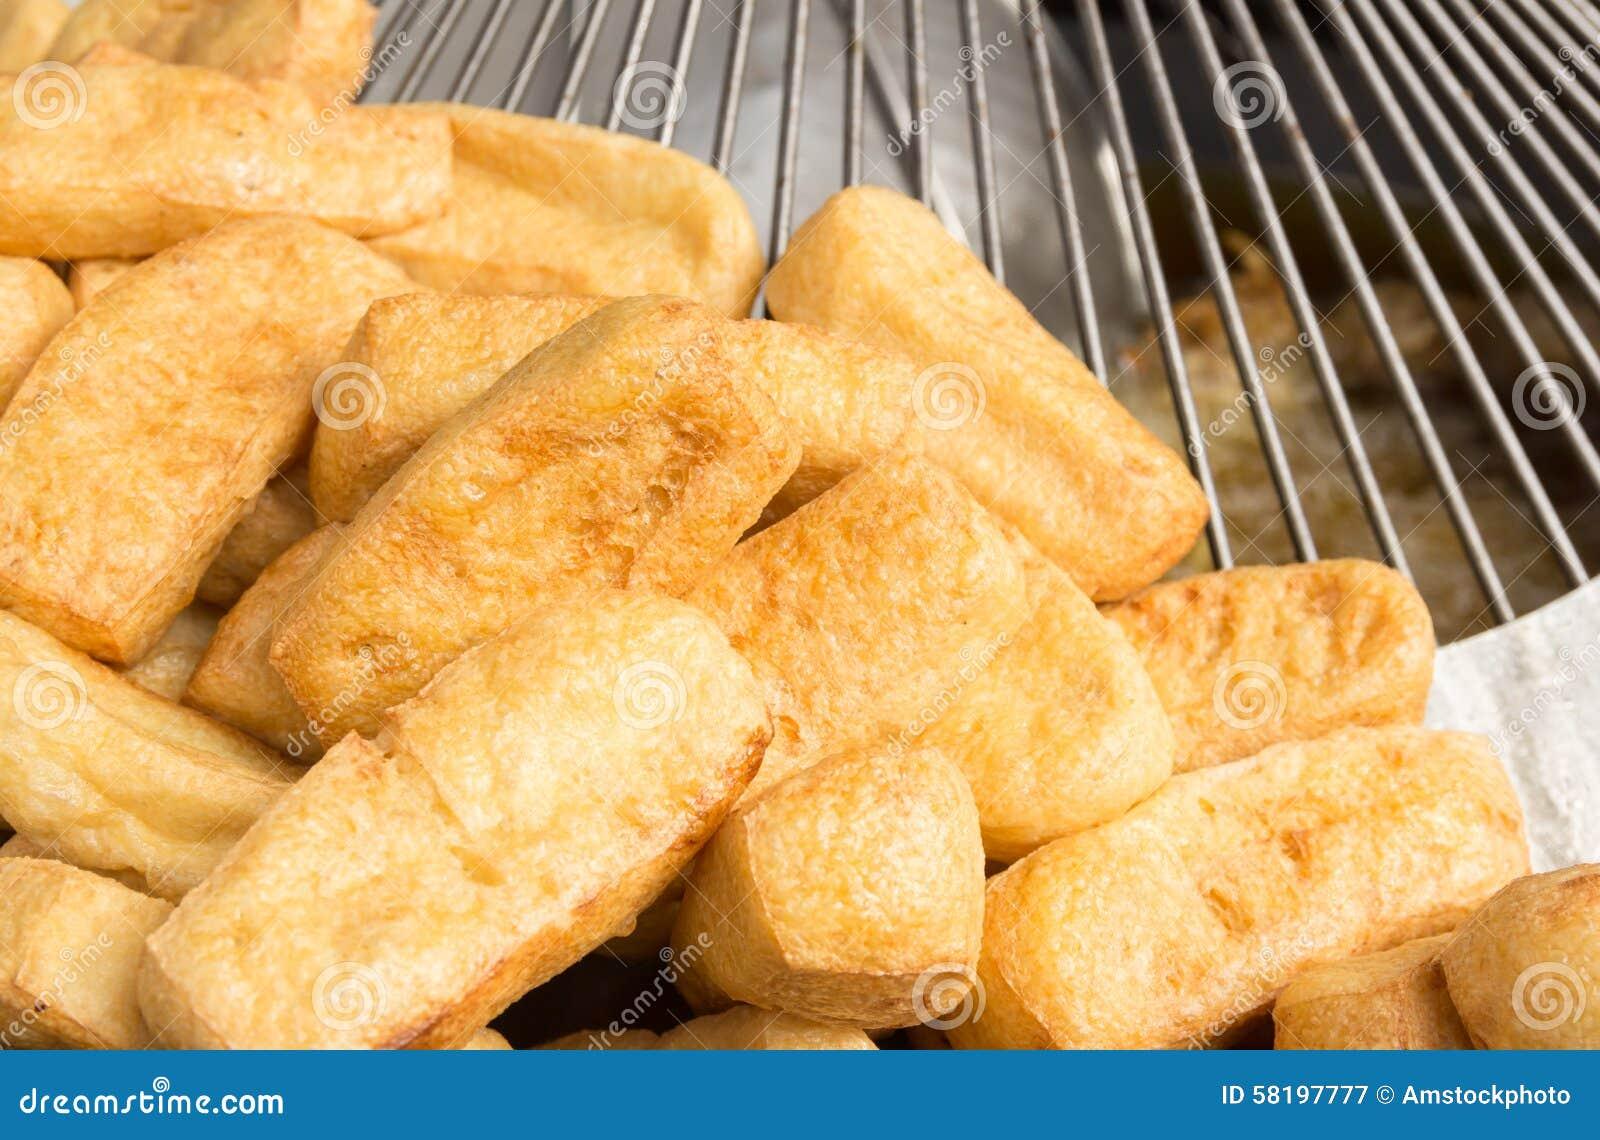 Cuajada de habichuelas frita, comida vegetariana